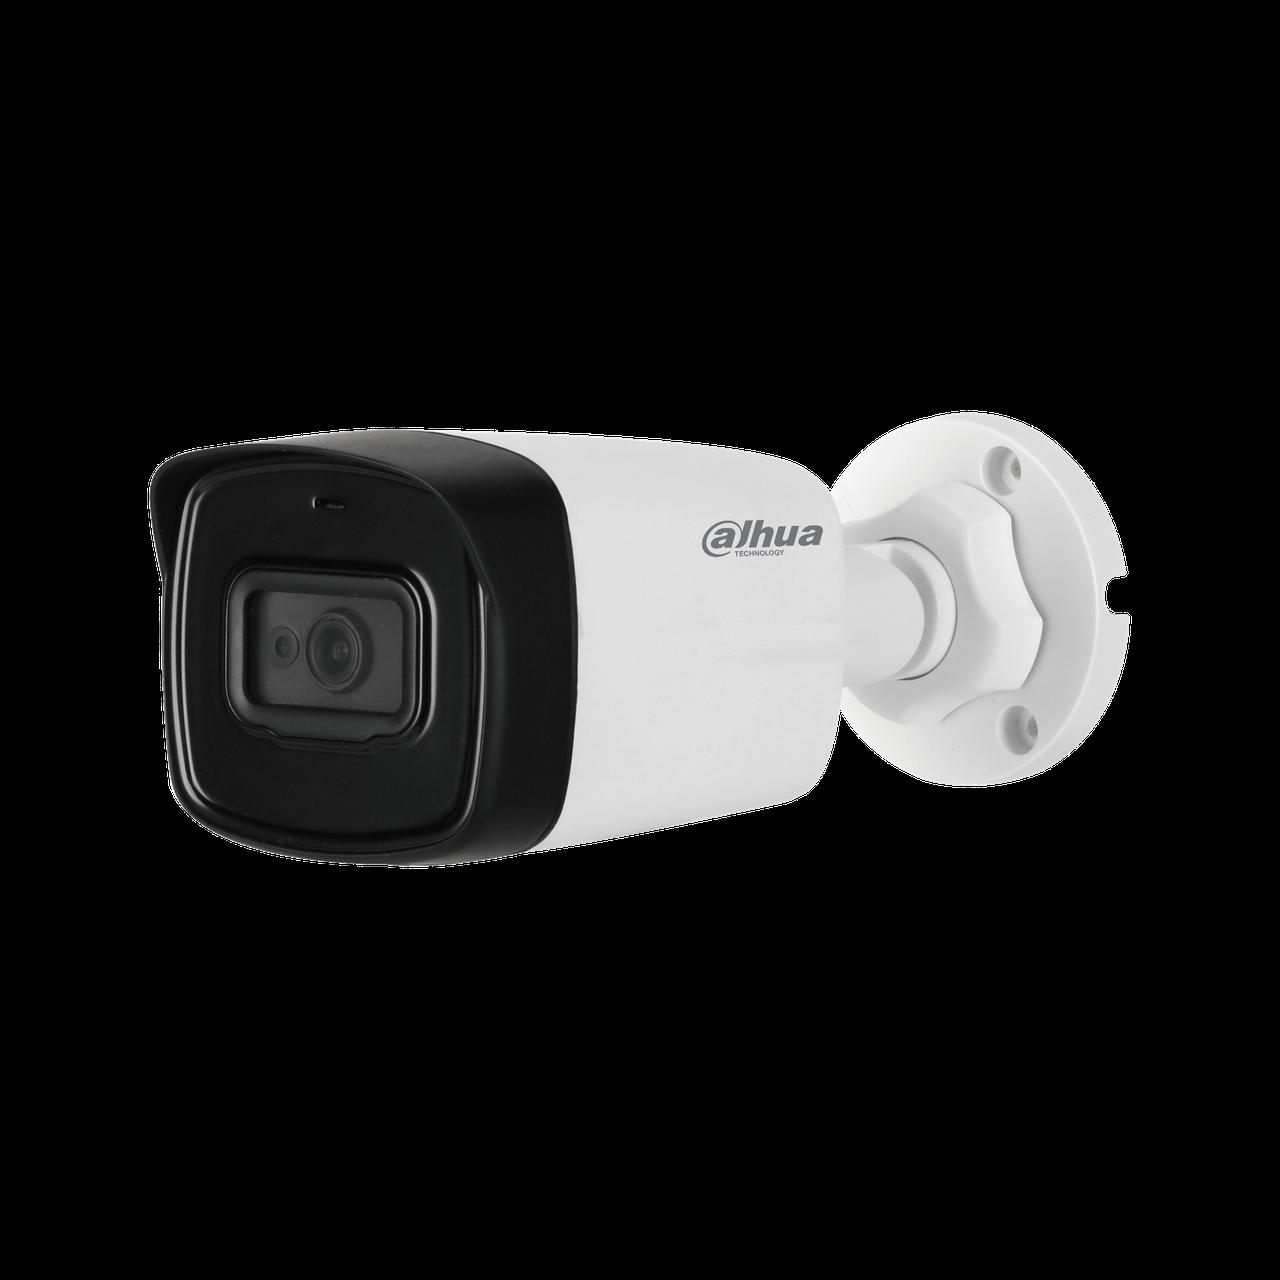 5 Мп HDCVI видеокамера Dahua DH-HAC-HFW2501TP-Z-A (2.7-13.5 мм)